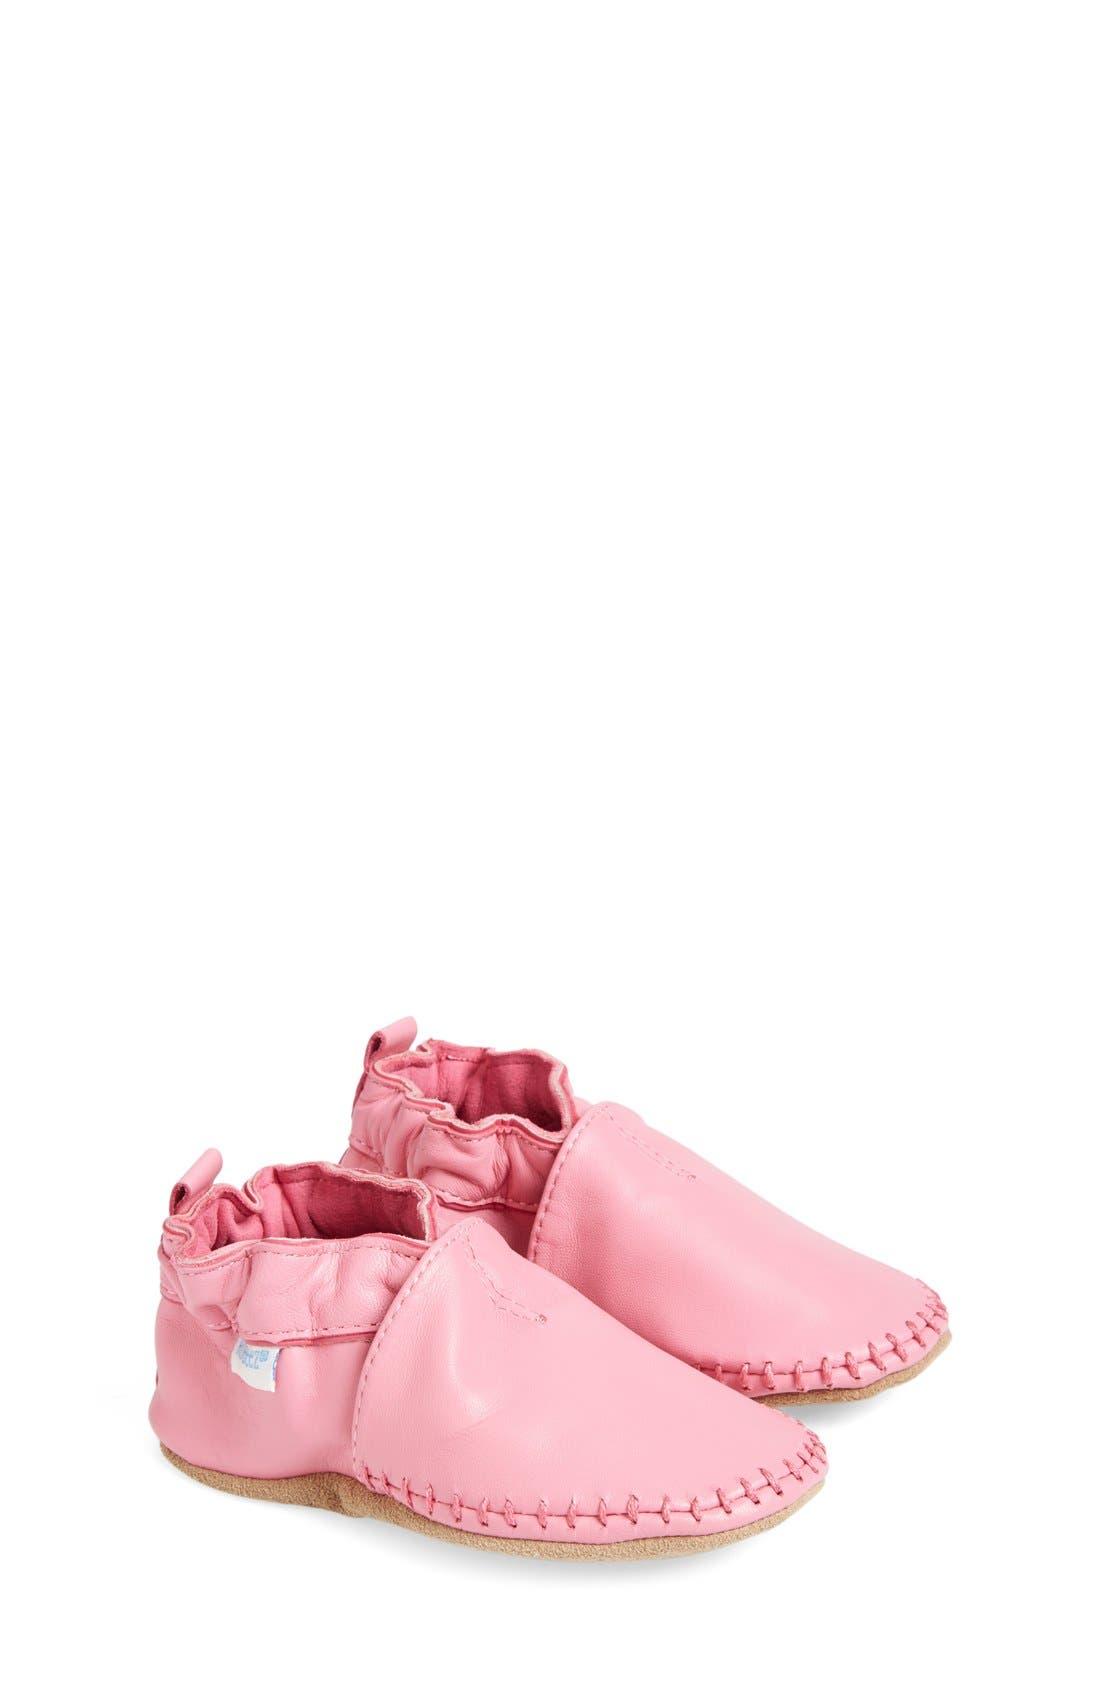 ROBEEZ® 'Classic Moccasin' Crib Shoe